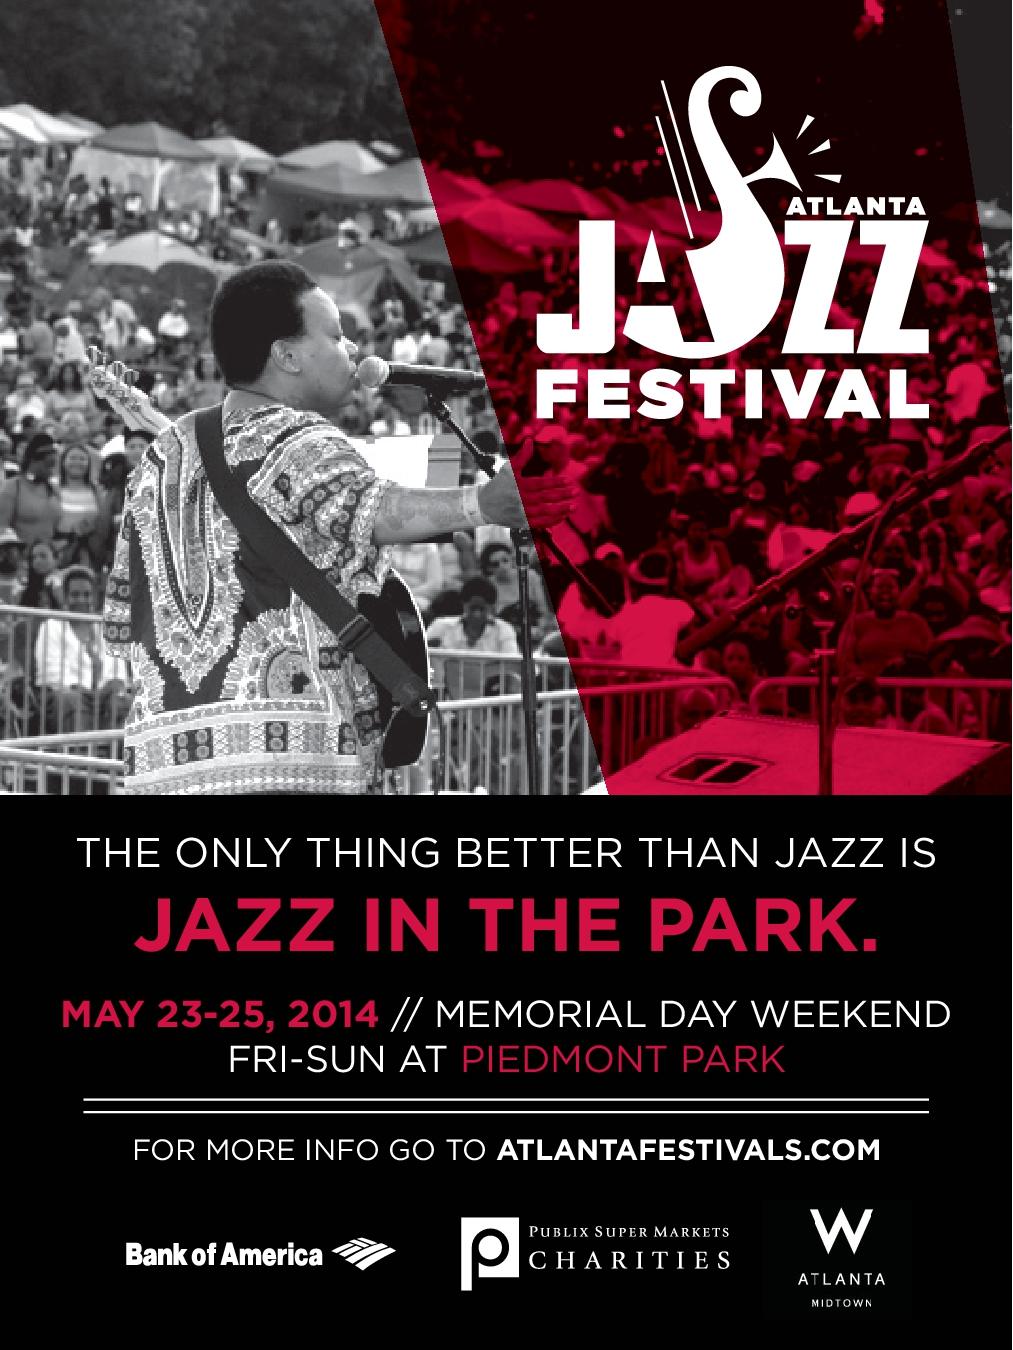 Atlanta Jazz Festival Flyer